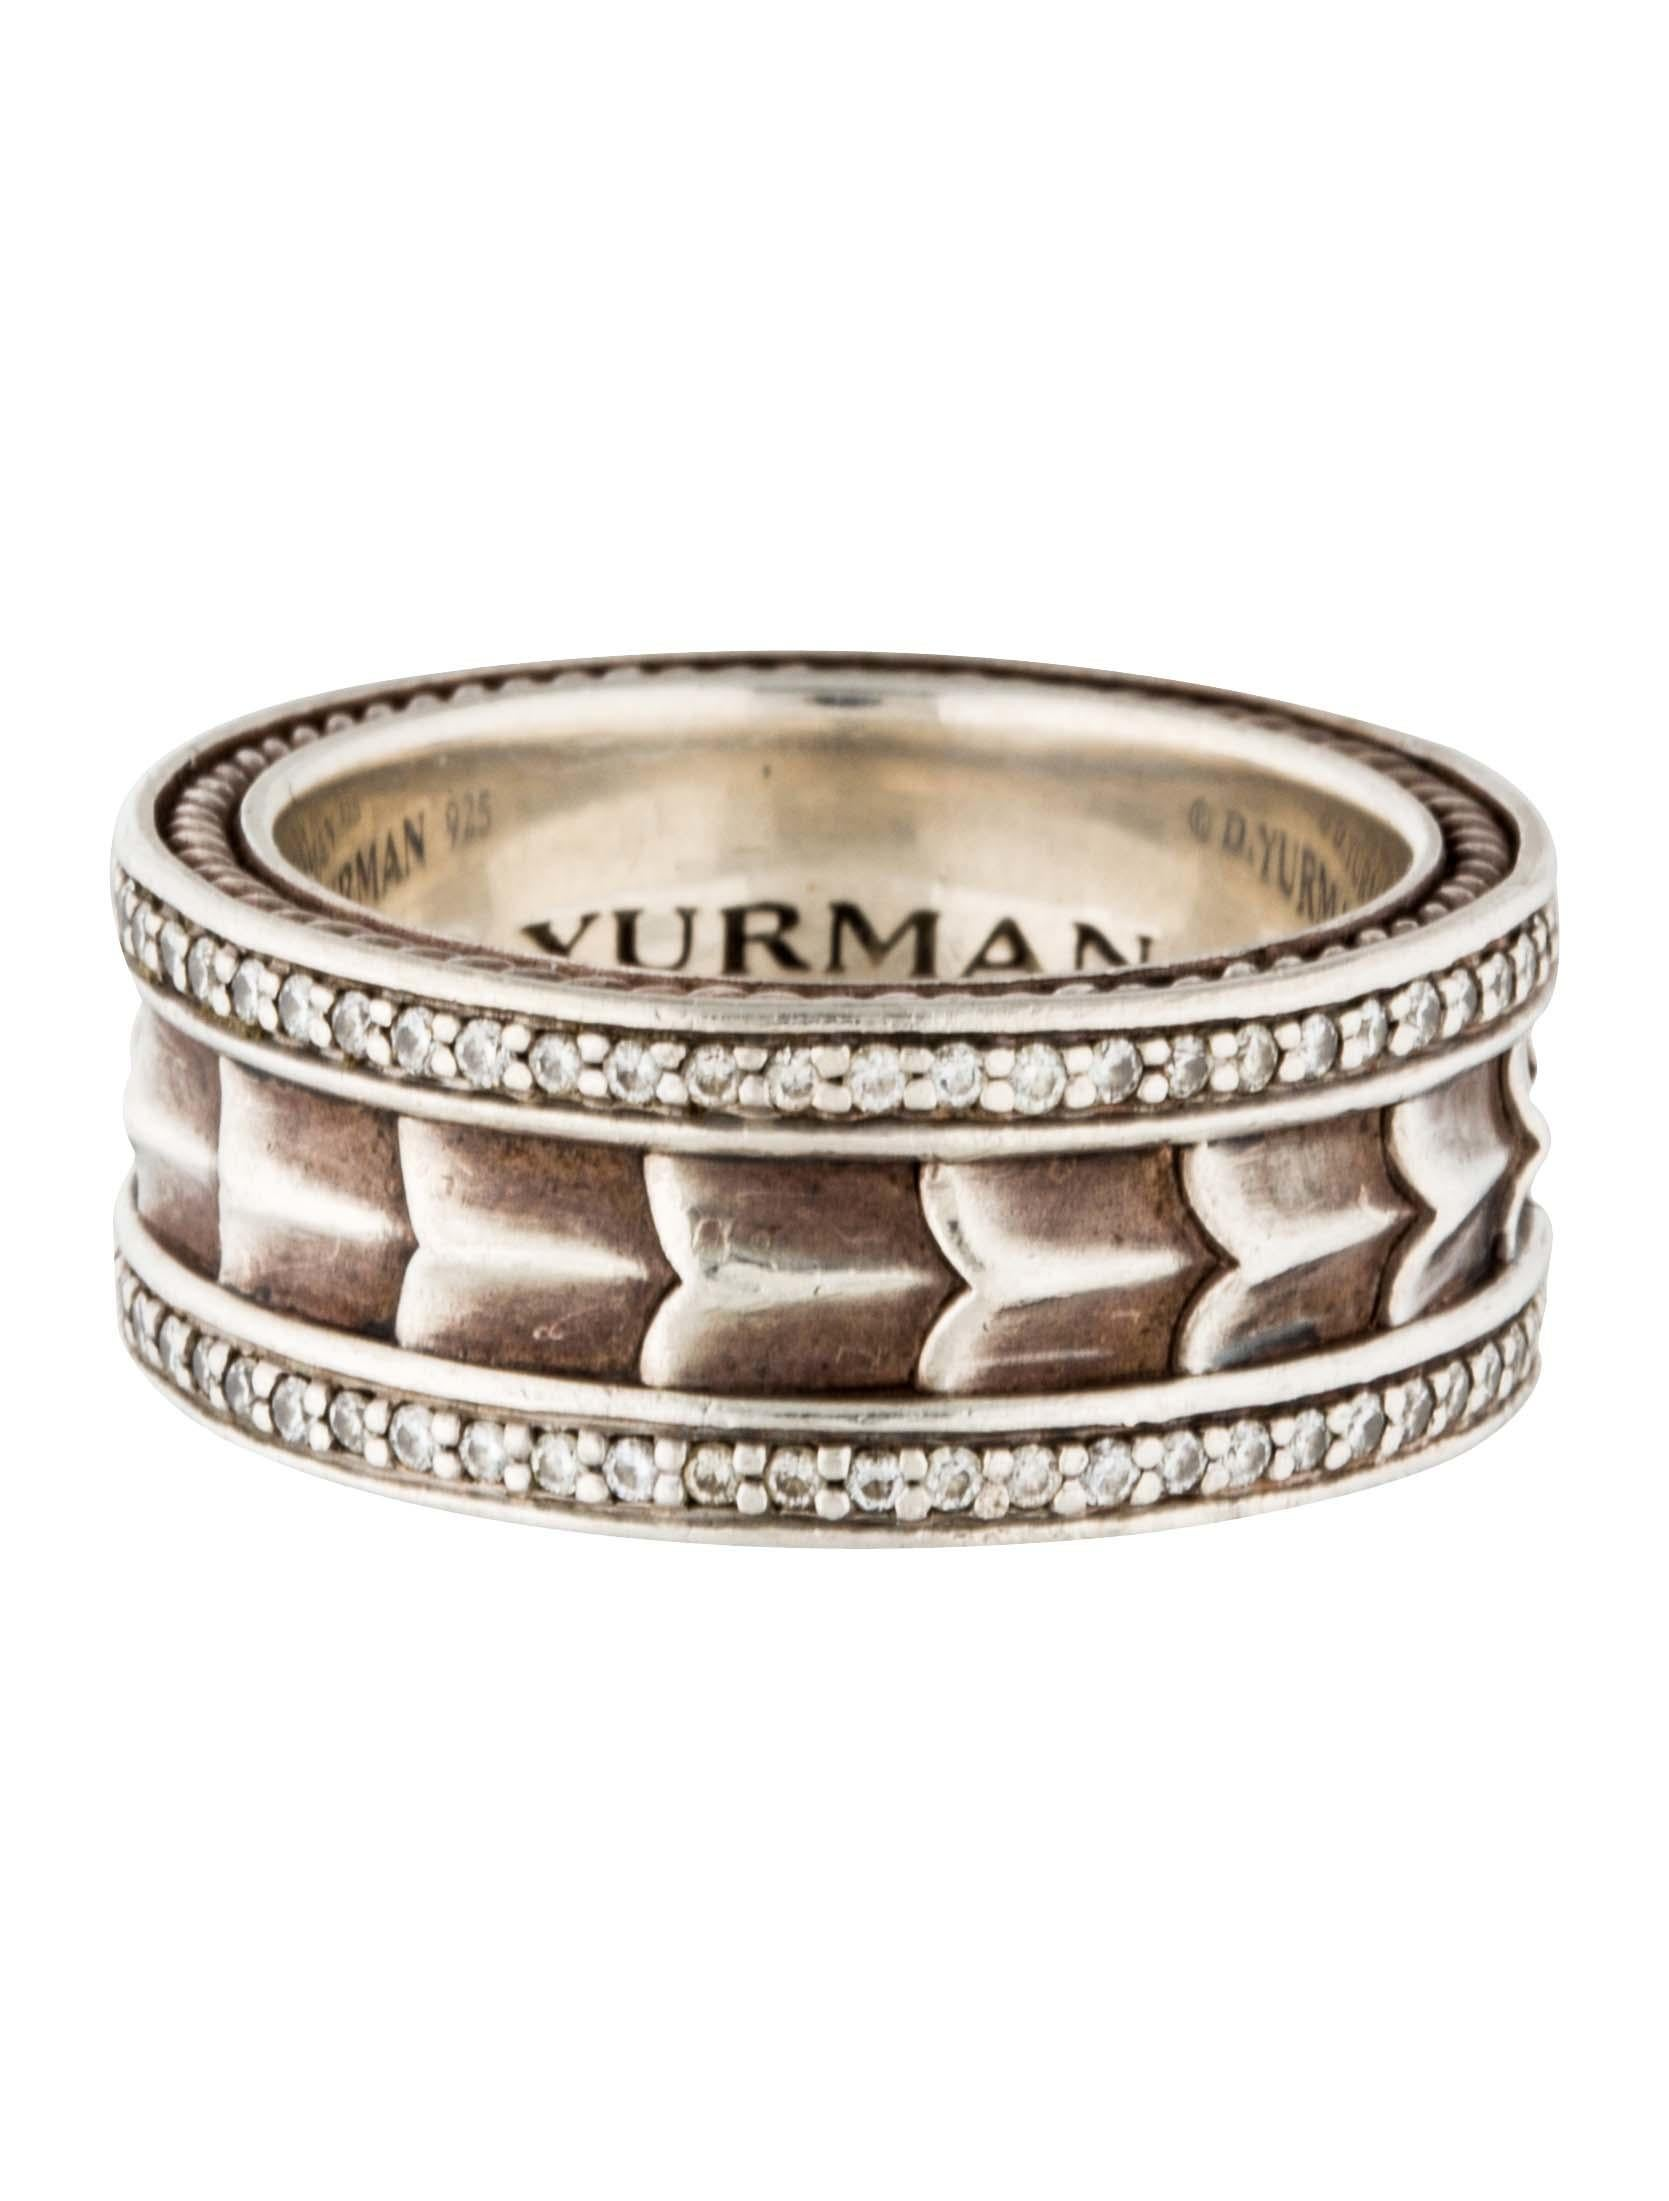 David yurman diamond armory band rings dvy36344 the for David yurman inspired jewelry rings